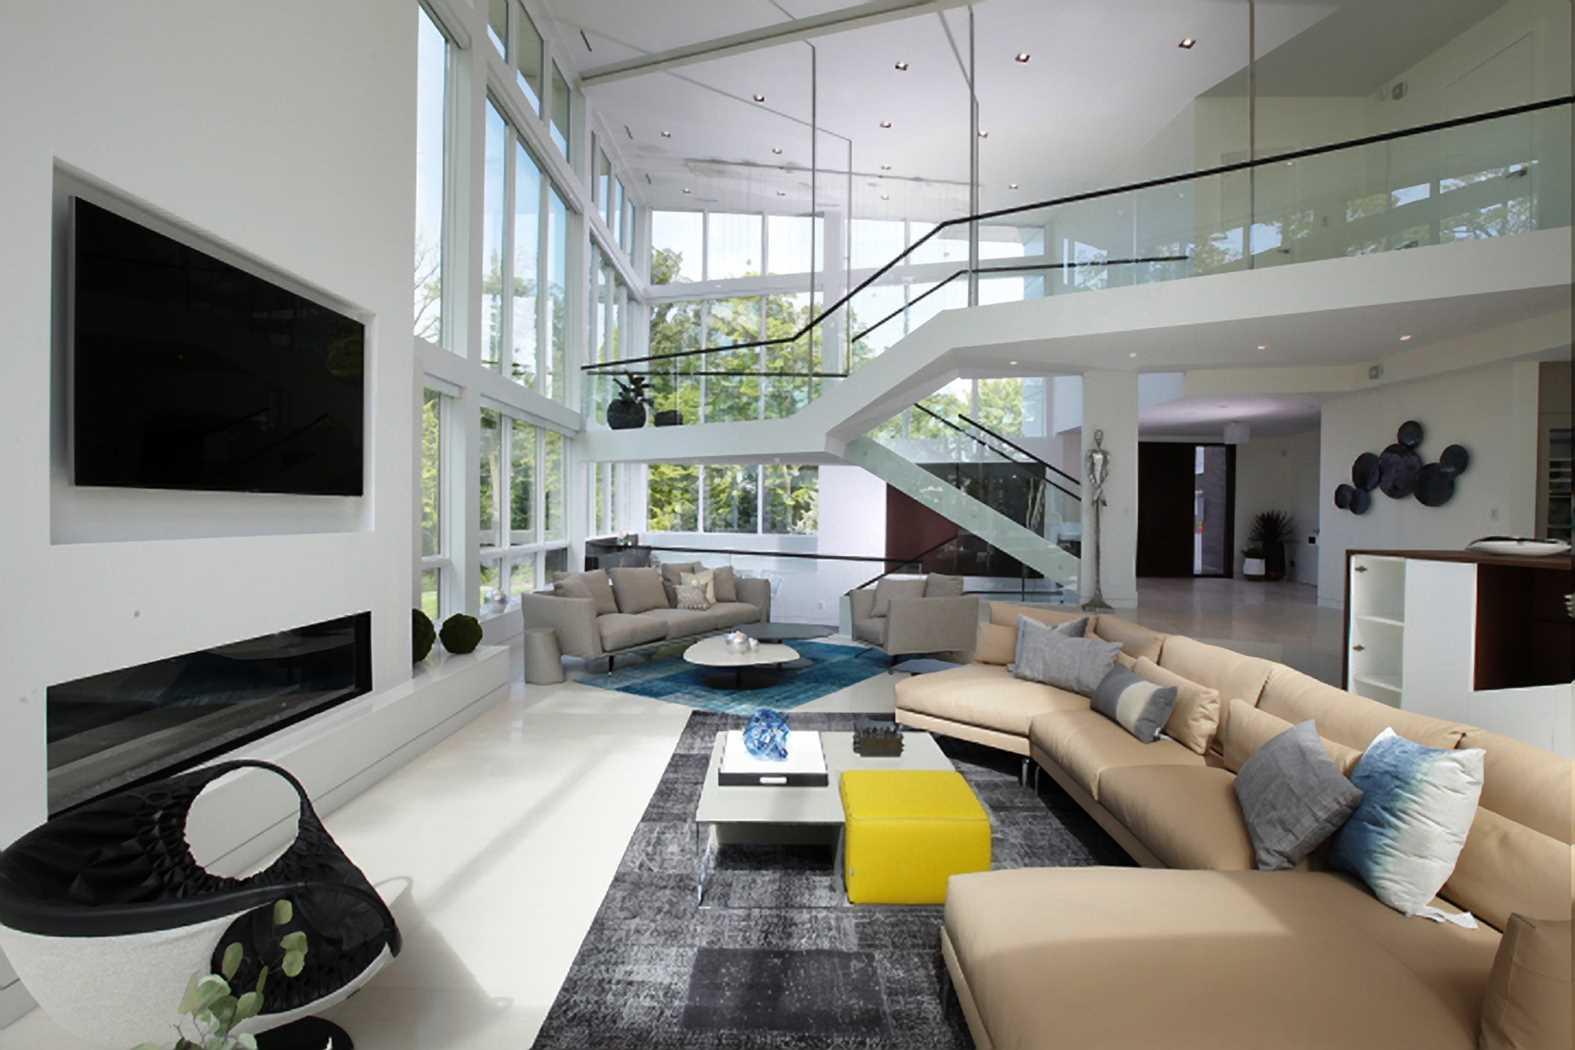 Edge of Modernism - Dkor Interiors